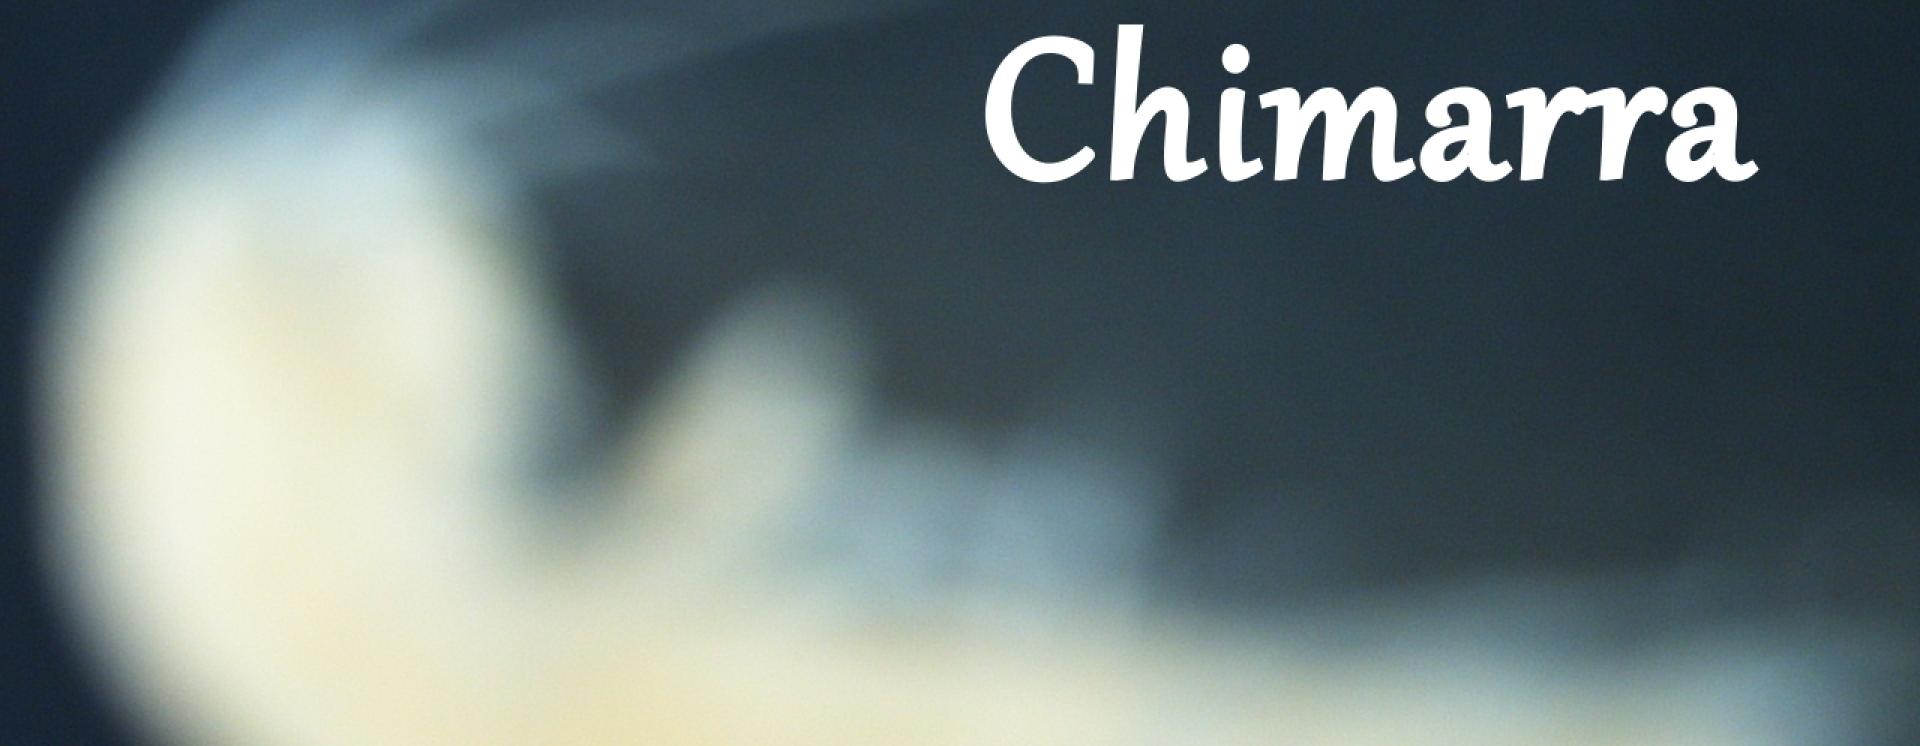 1444537956 chimarra sticker copy